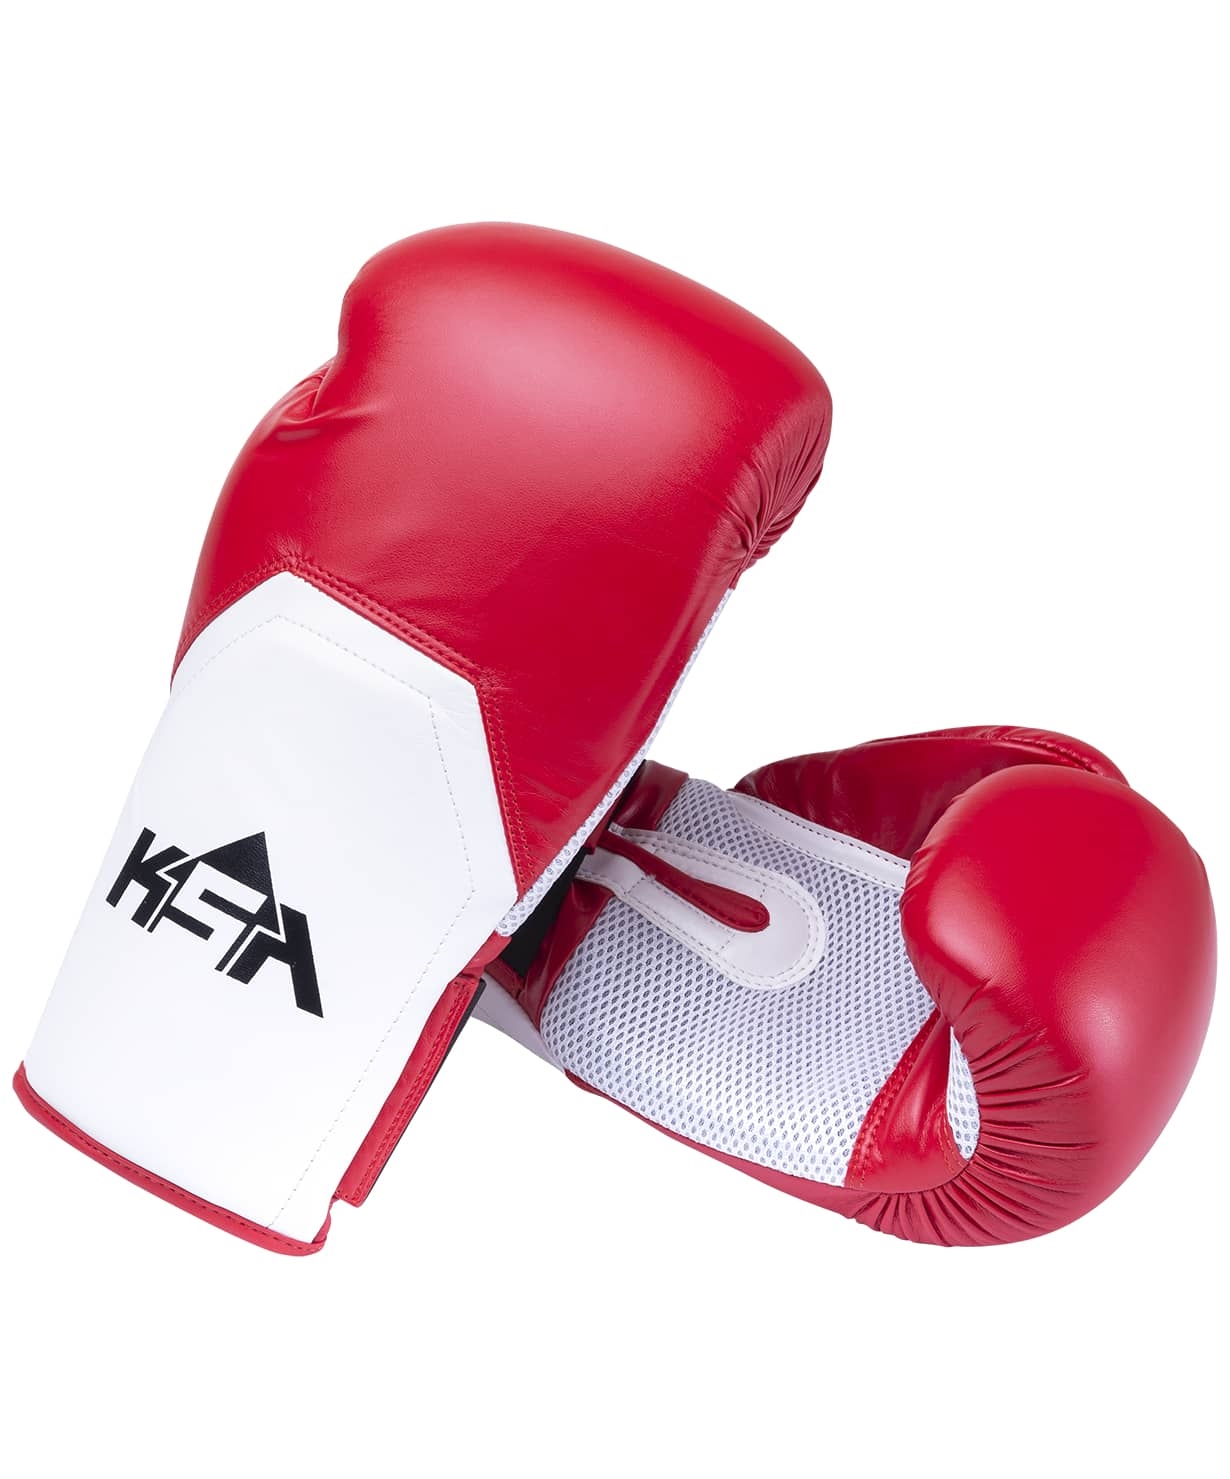 Перчатки боксерские Scorpio Red, к/з, 14 oz